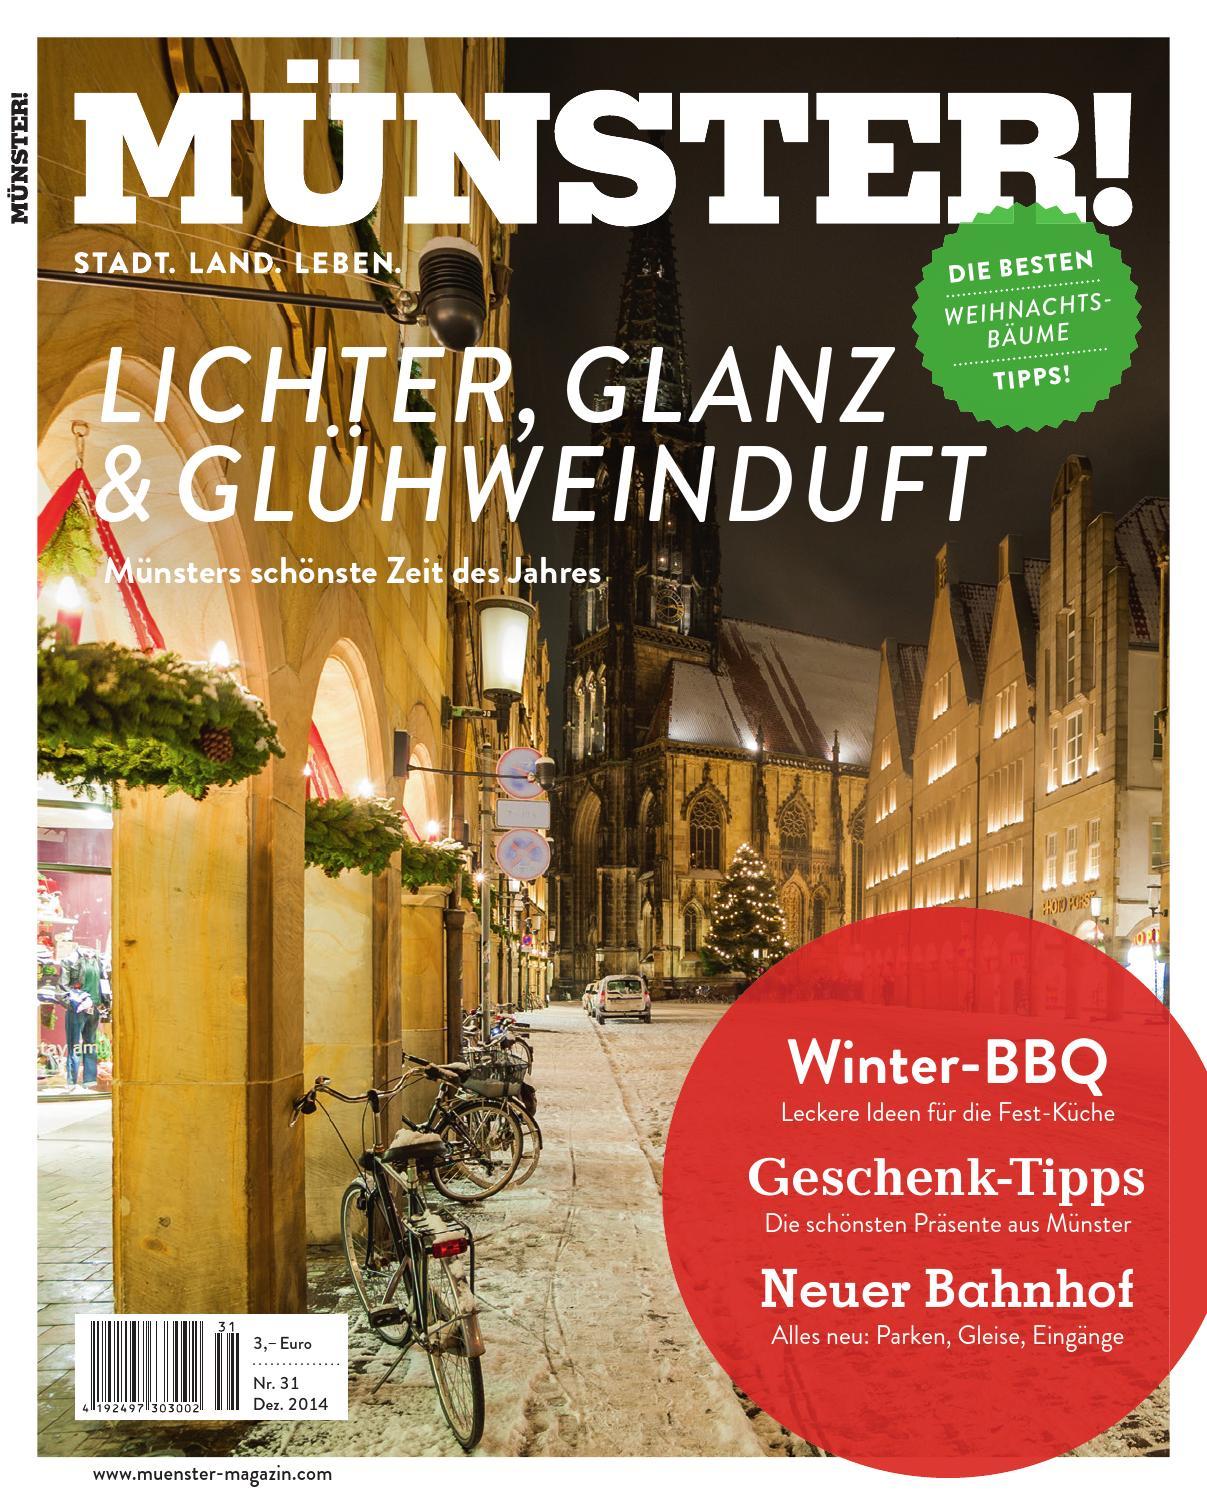 MÜNSTER! Nr. 23 März 2014 by MÜNSTER! Magazin - issuu